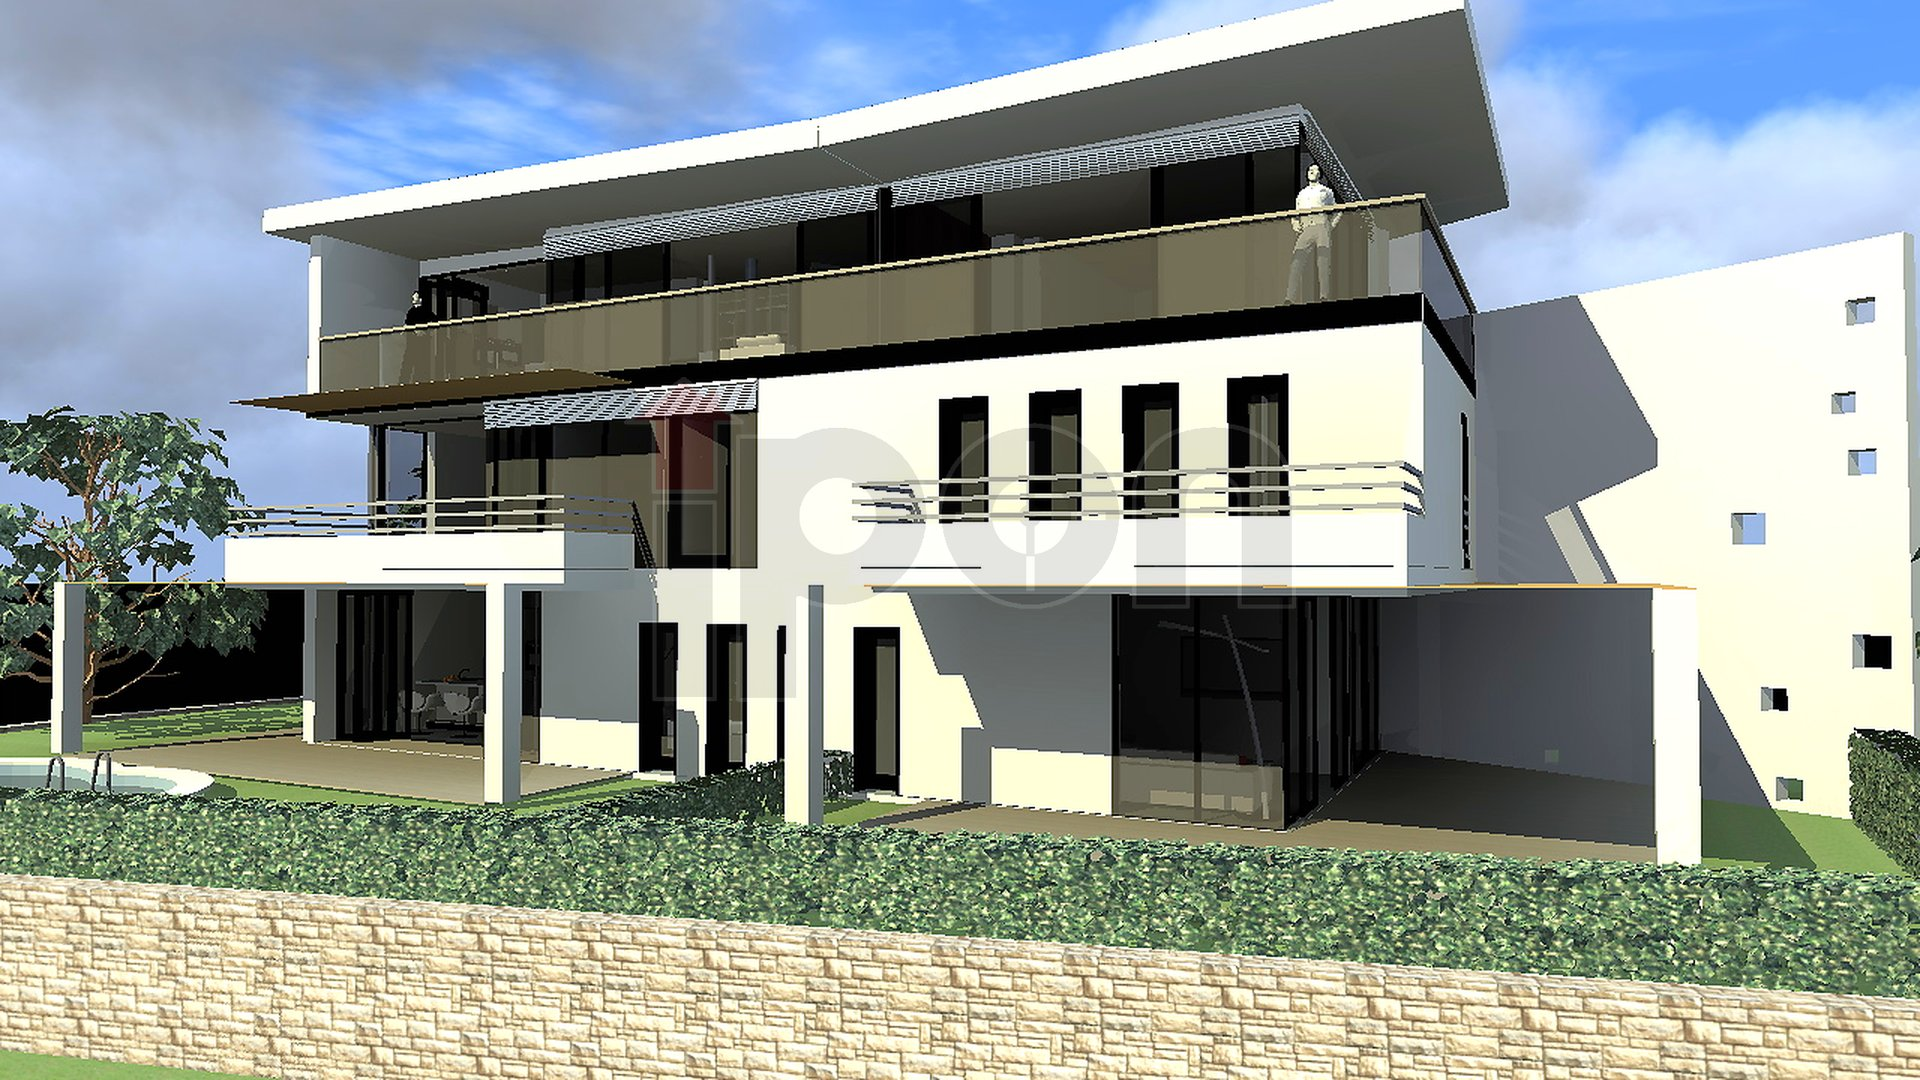 Wohnung, 130 m2, Verkauf, Rijeka - Kozala